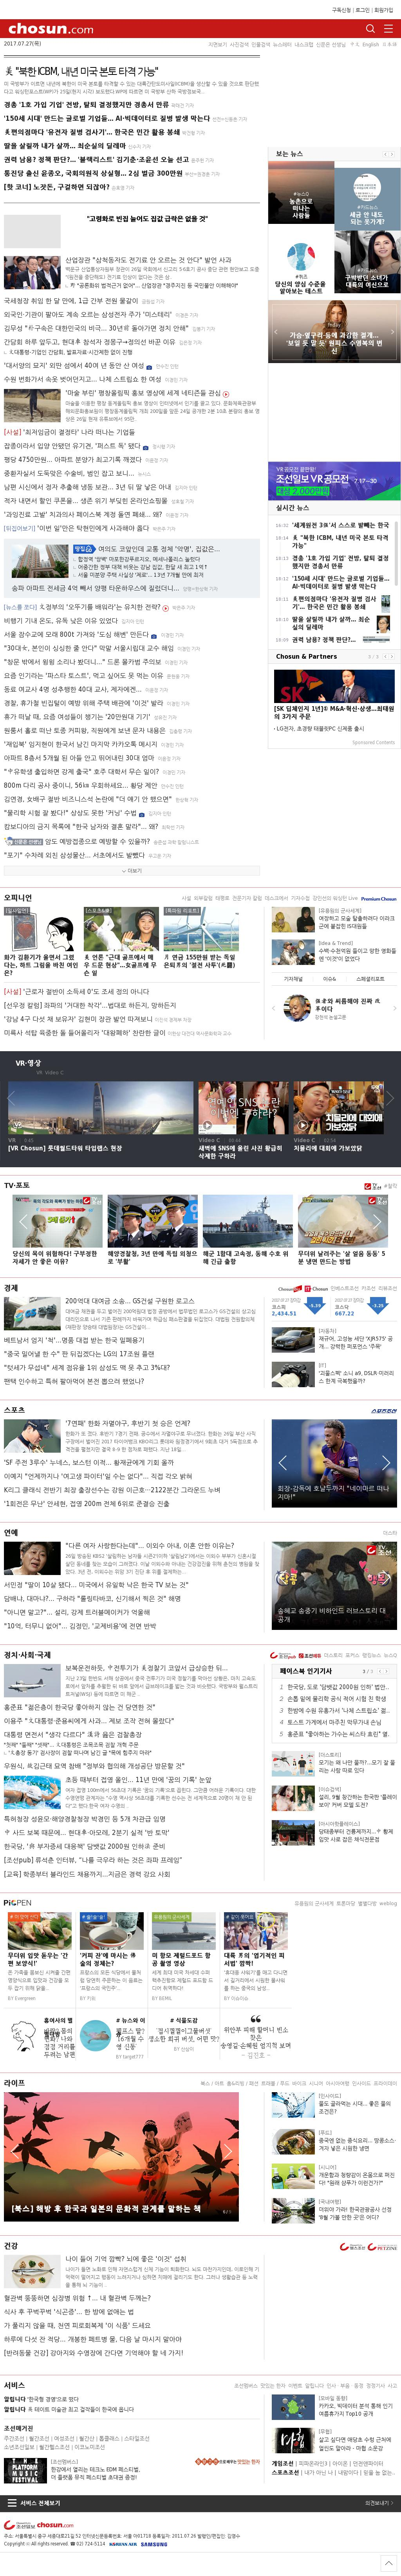 chosun.com at Wednesday July 26, 2017, 7:02 p.m. UTC